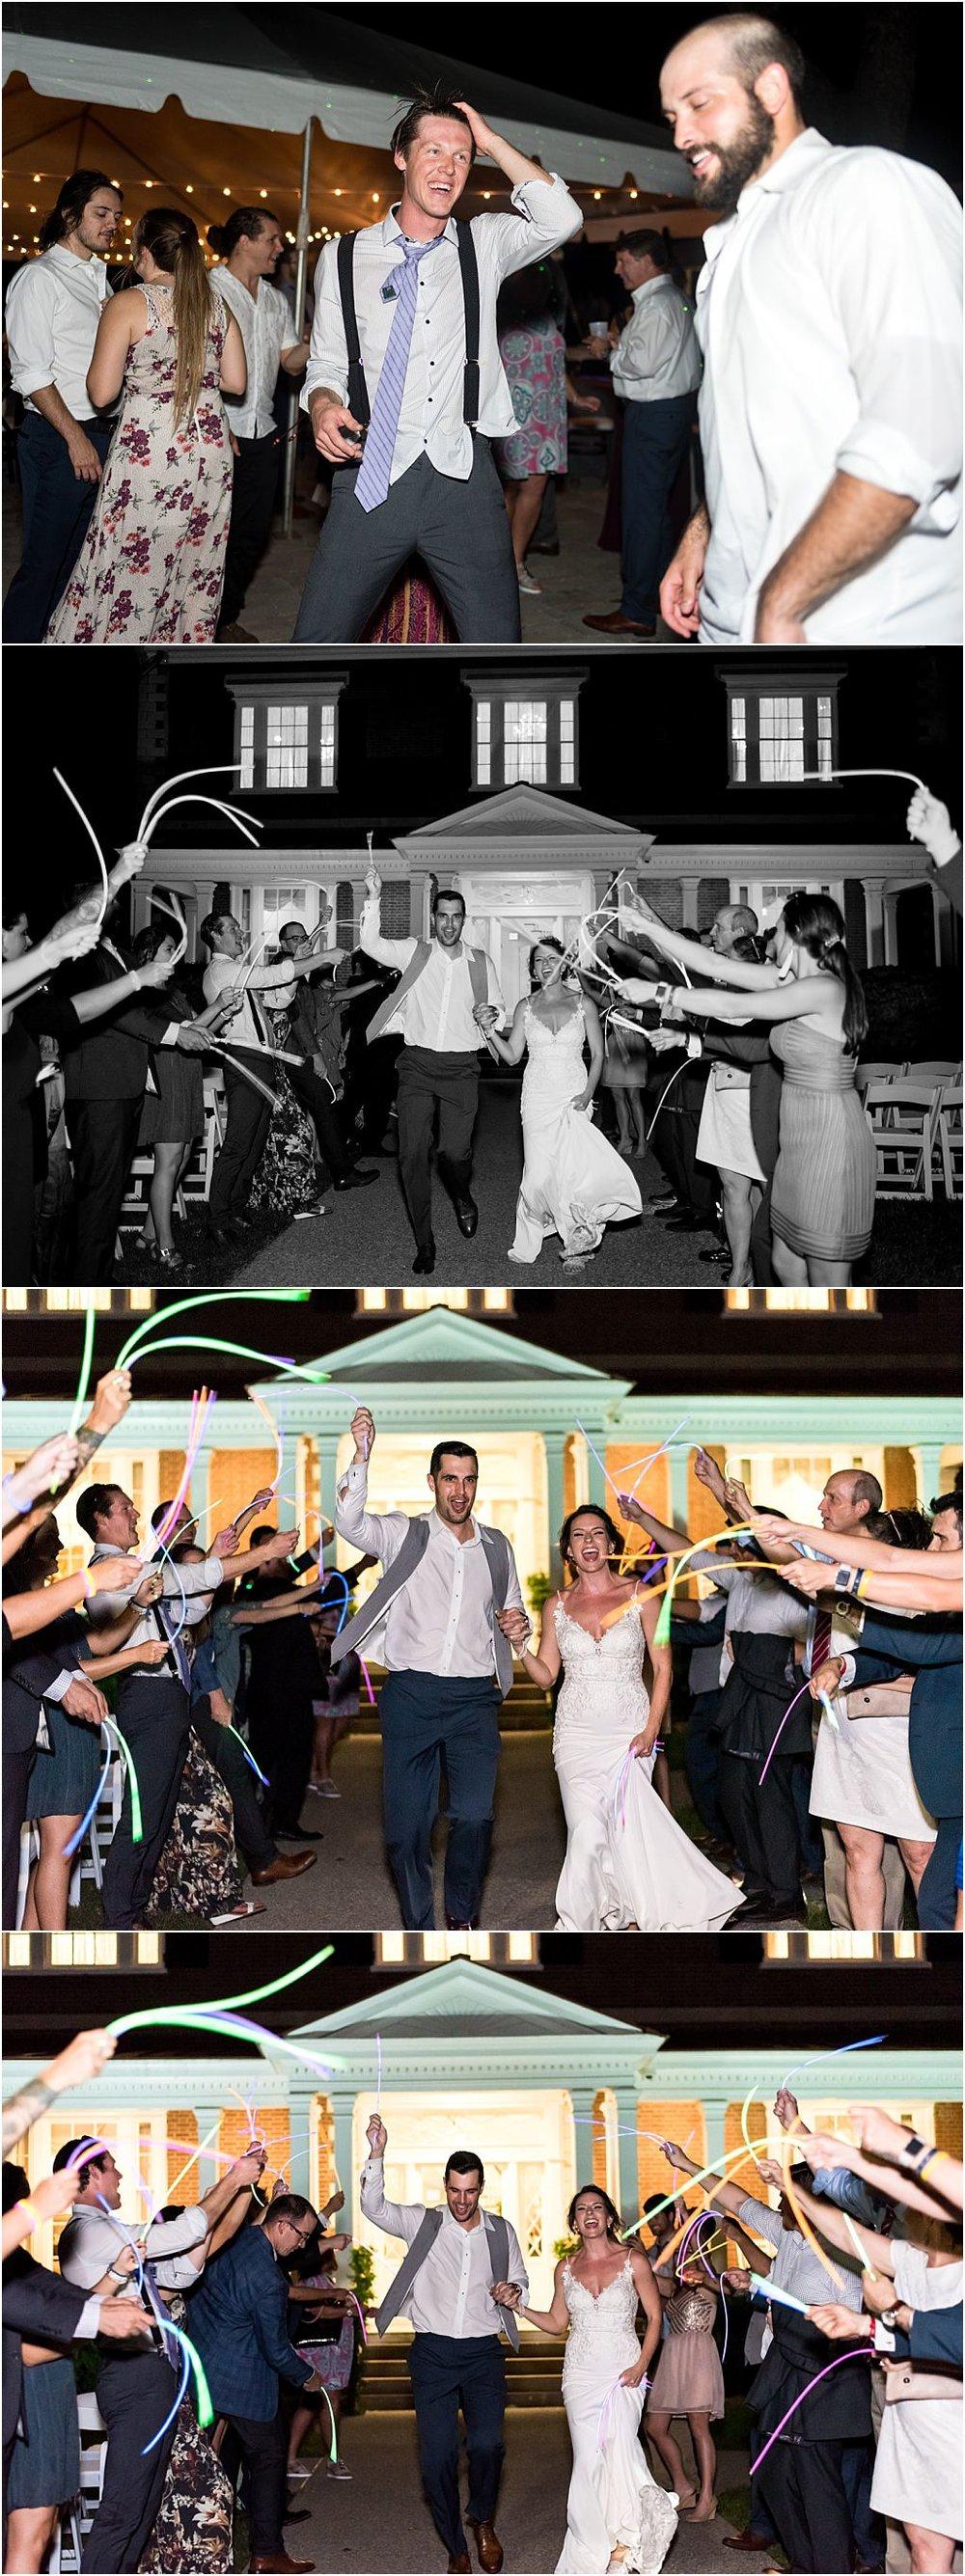 Jordan-and-Anna-Ravenswood-Mansion-Wedding-in-Brentwood-TN-Nashville-Wedding-Photographers+13